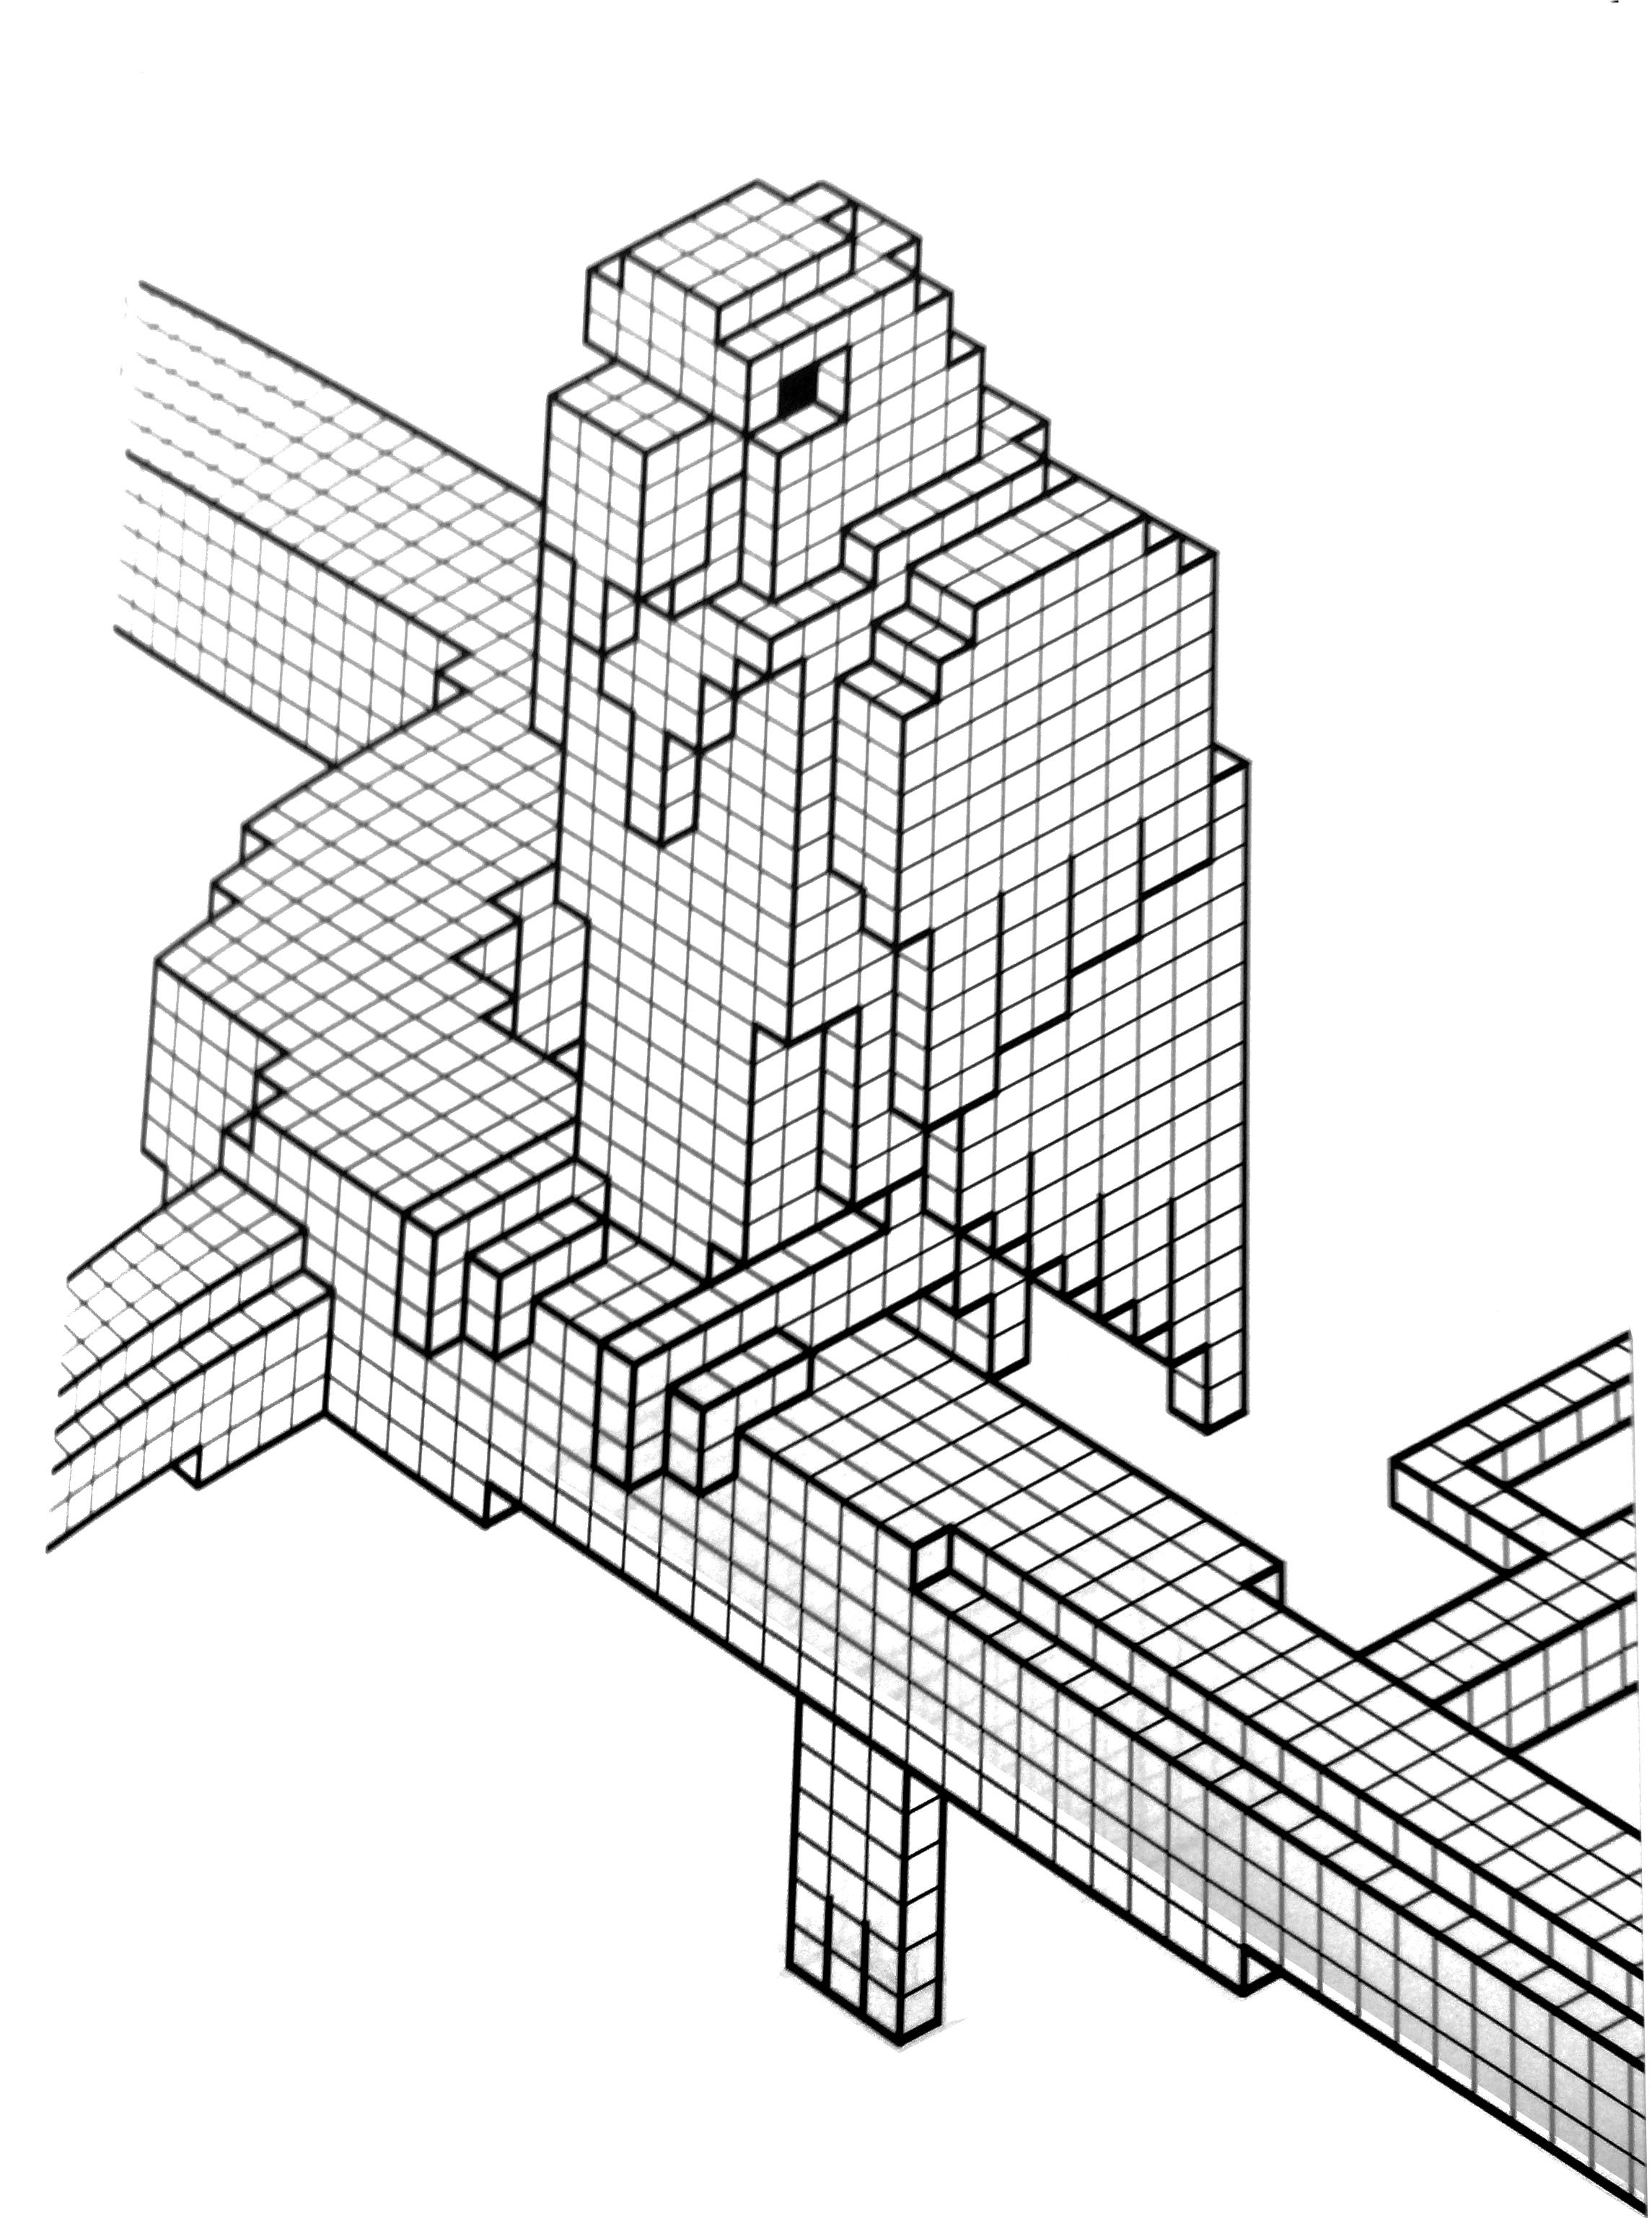 2290x3075 Pixelations. Interlocking Cubes Reminiscent Of Legos, Minecraft